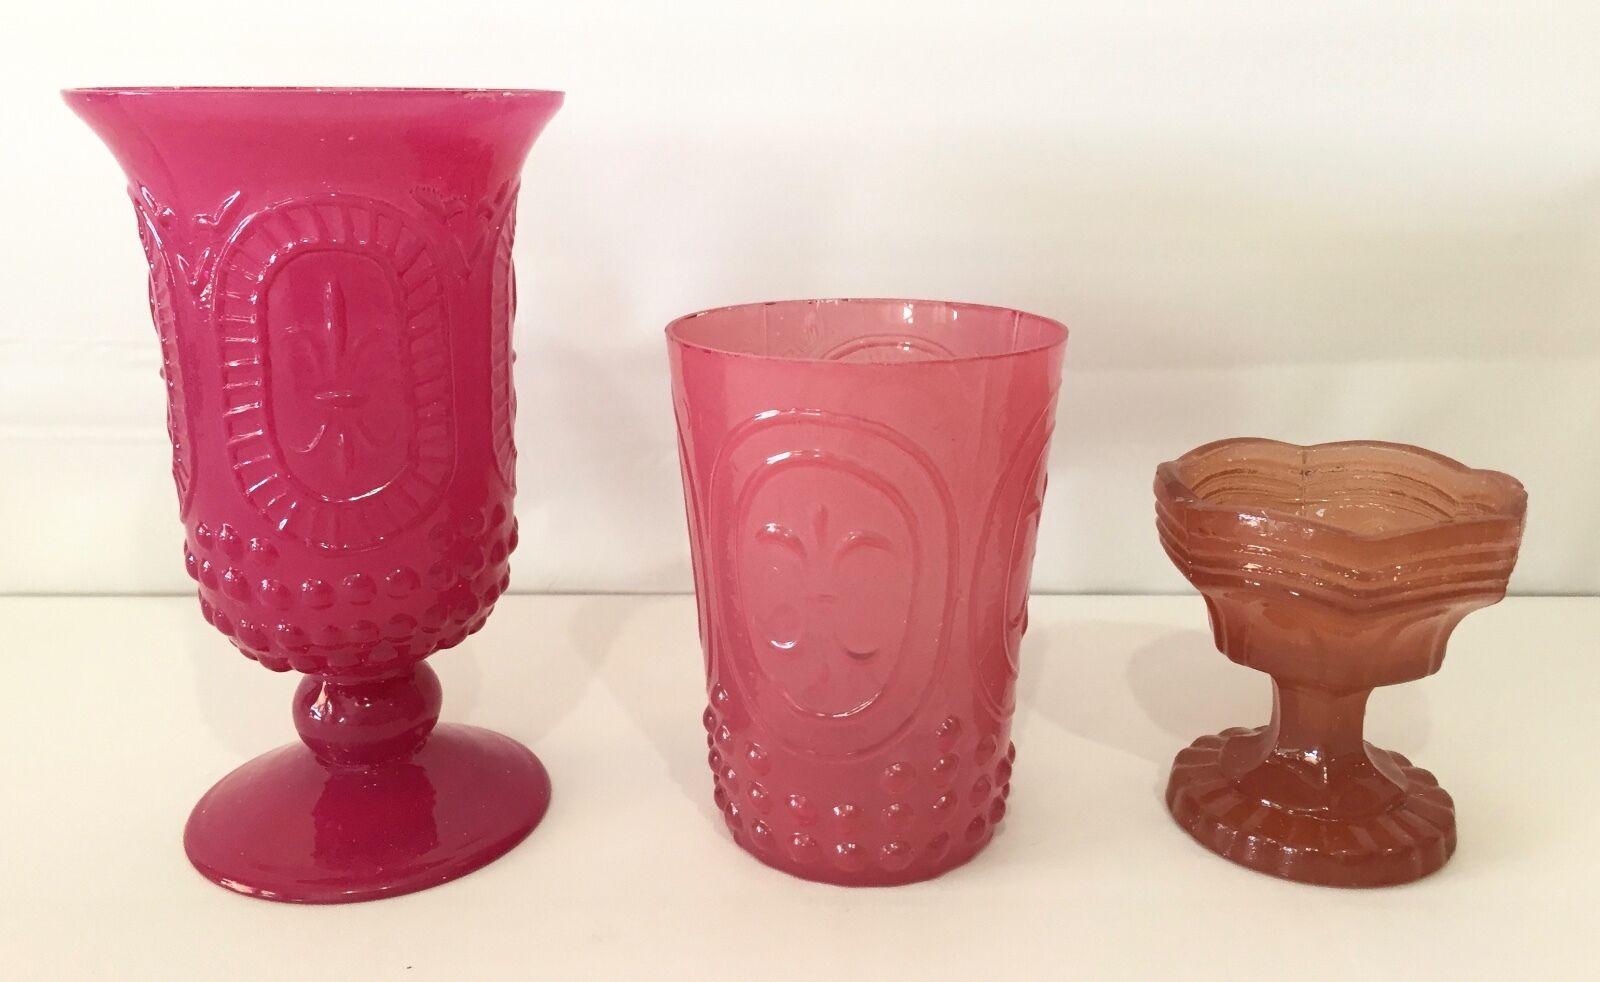 NEW Pottery Barn Pressed Glass Votives, SET OF 3